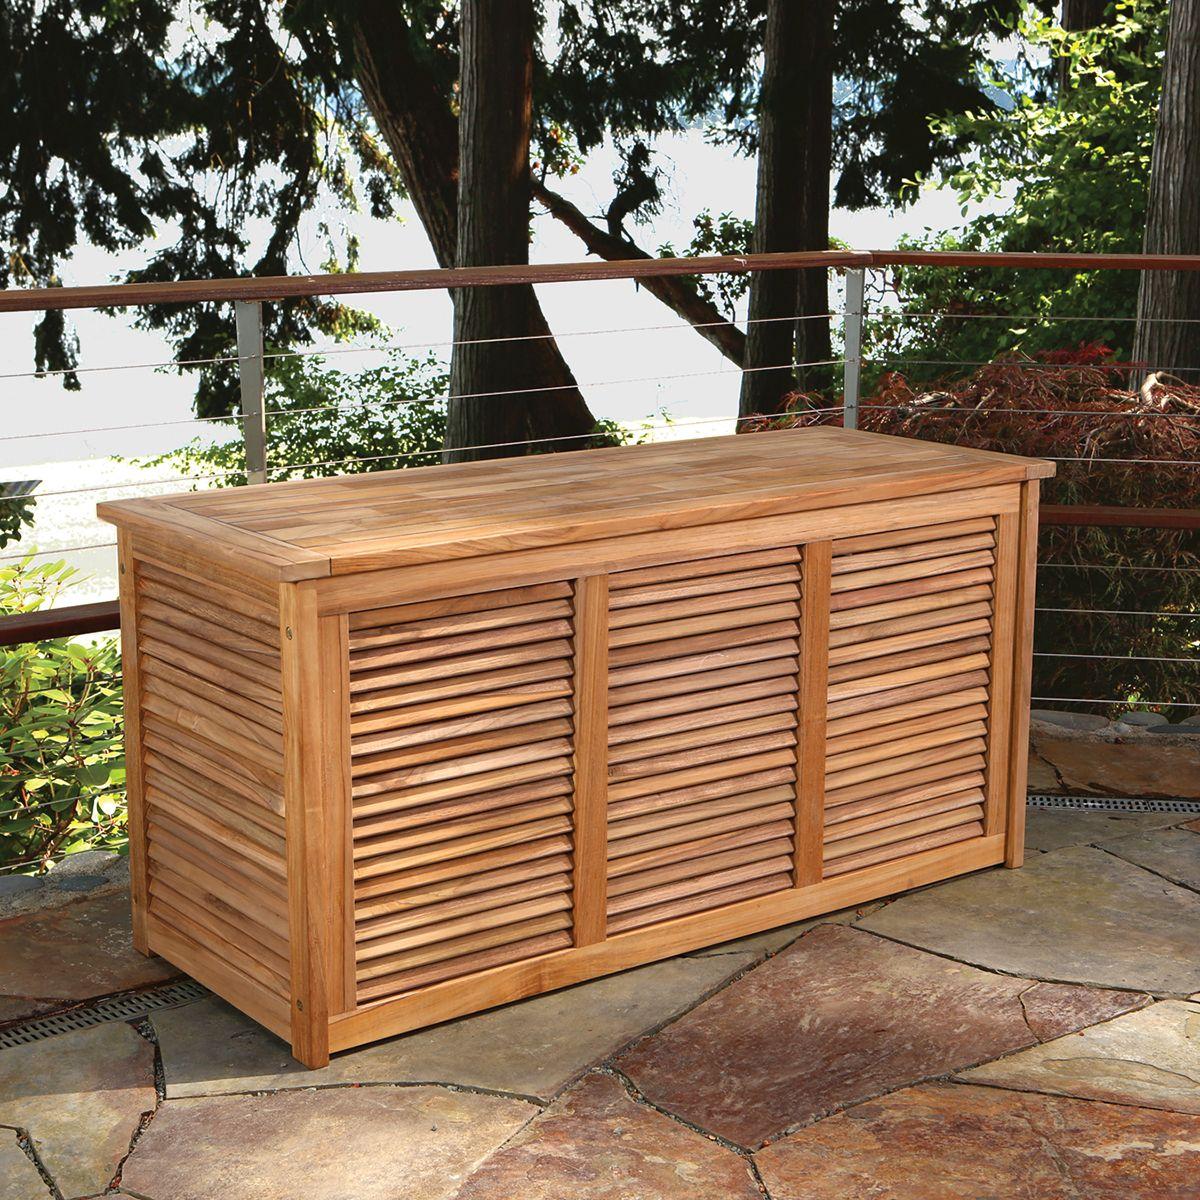 Teak Louvered Panel Outdoor Storage Box | Bainbridge Collection